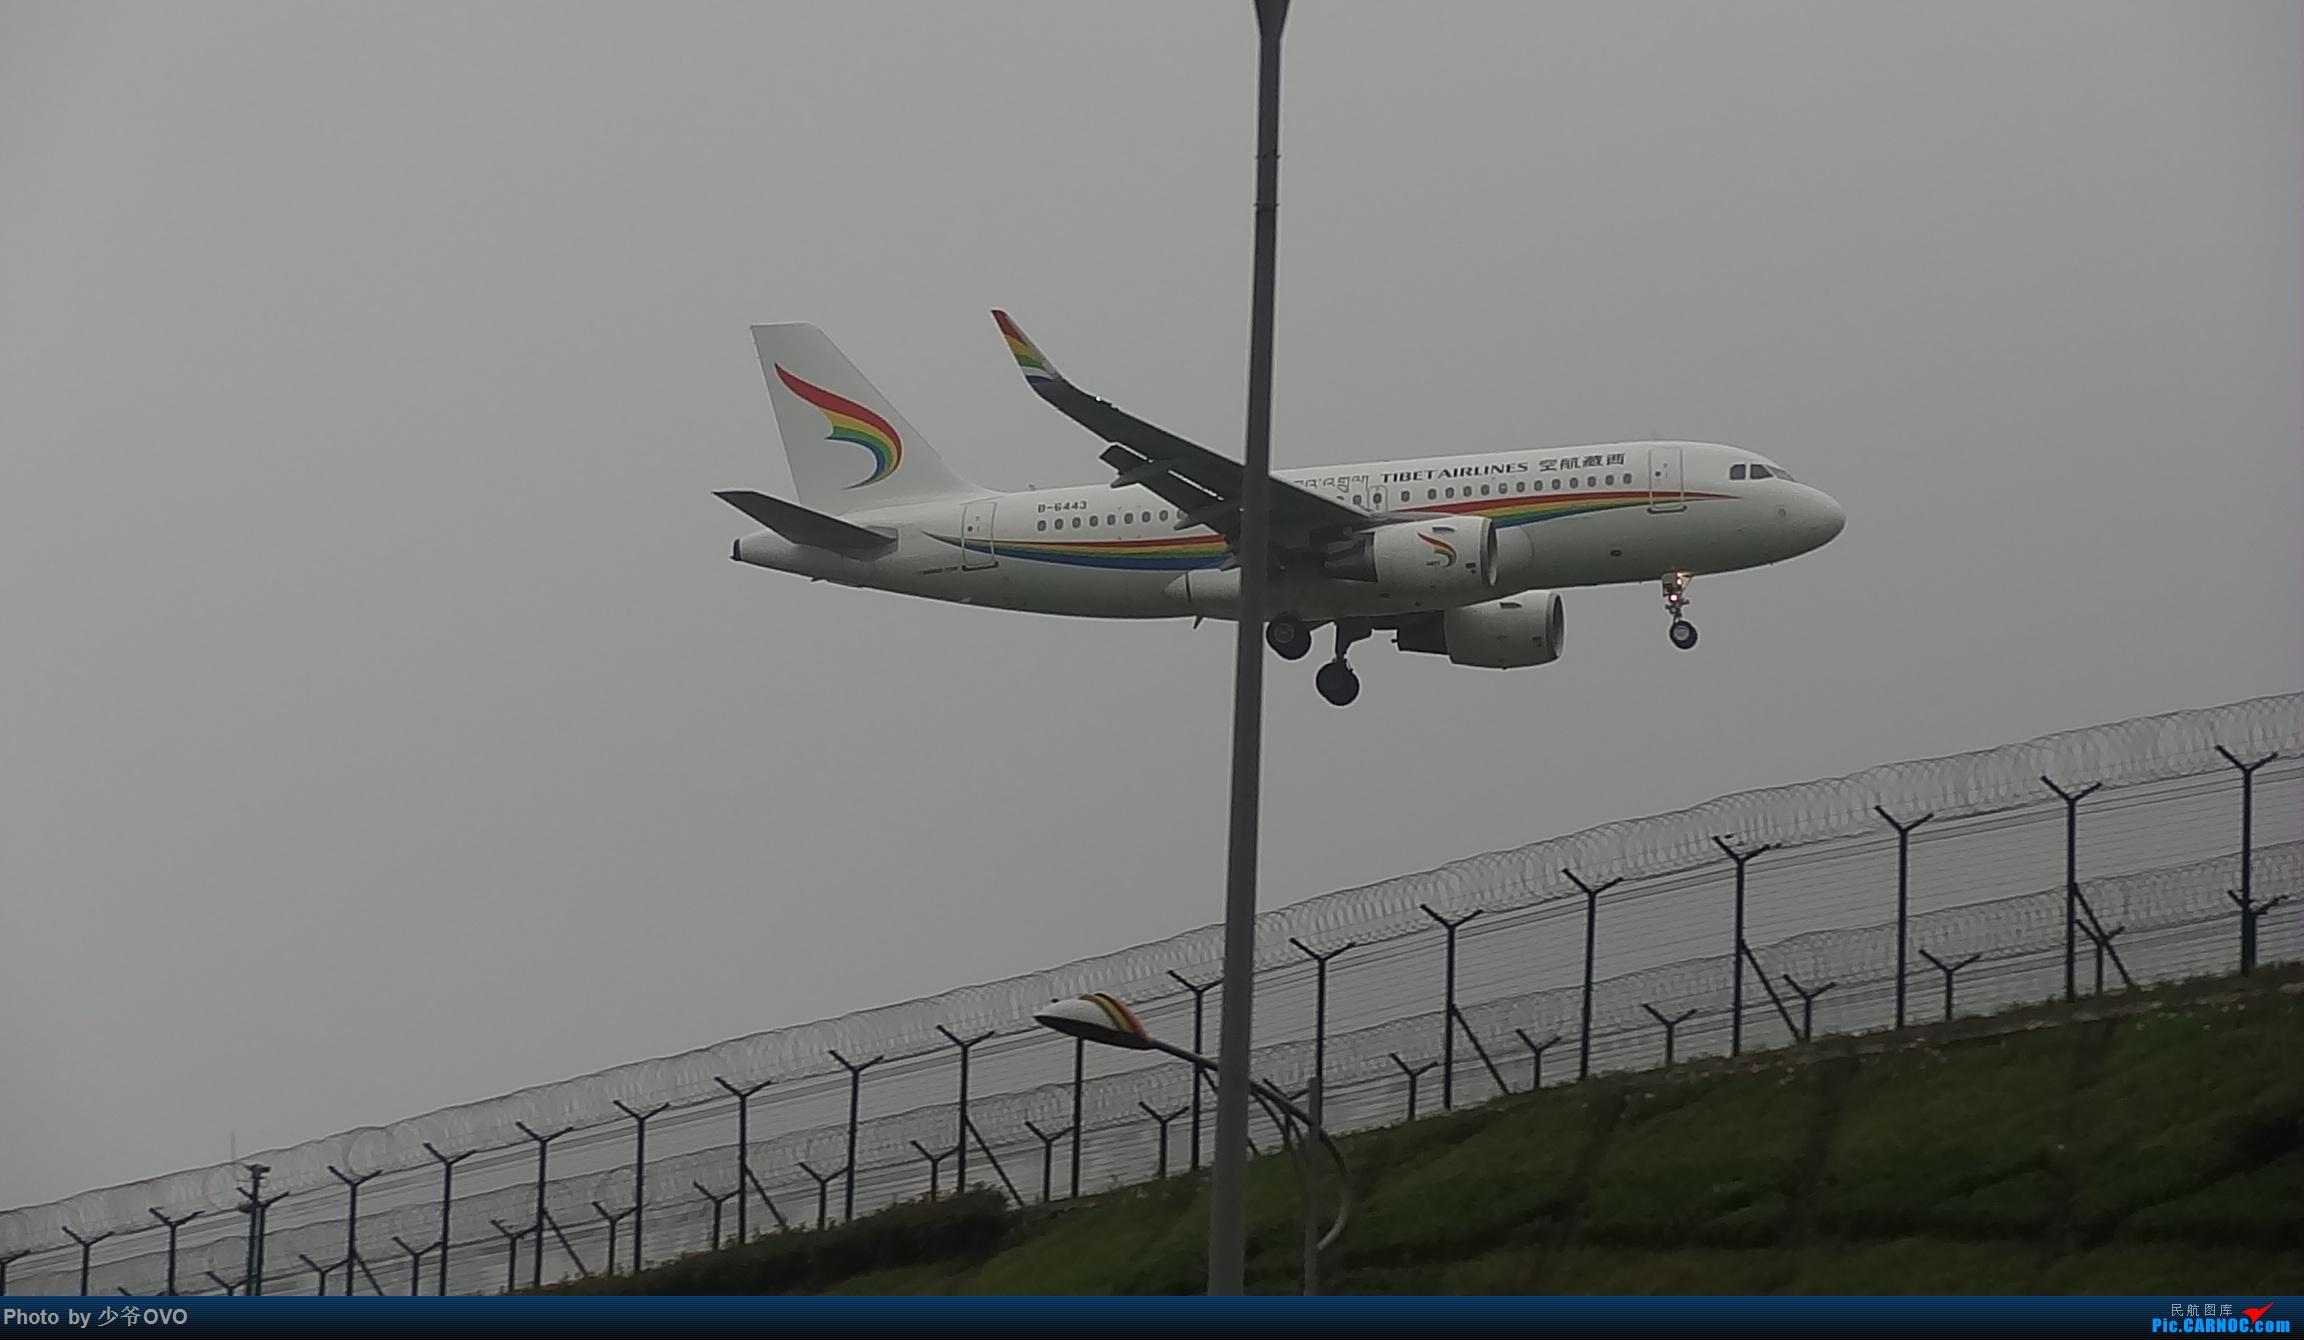 Re:[原创]CKG重庆江北机场拍机 ,渣图一堆,多指点 AIRBUS A319-100 B-6443 中国重庆江北国际机场